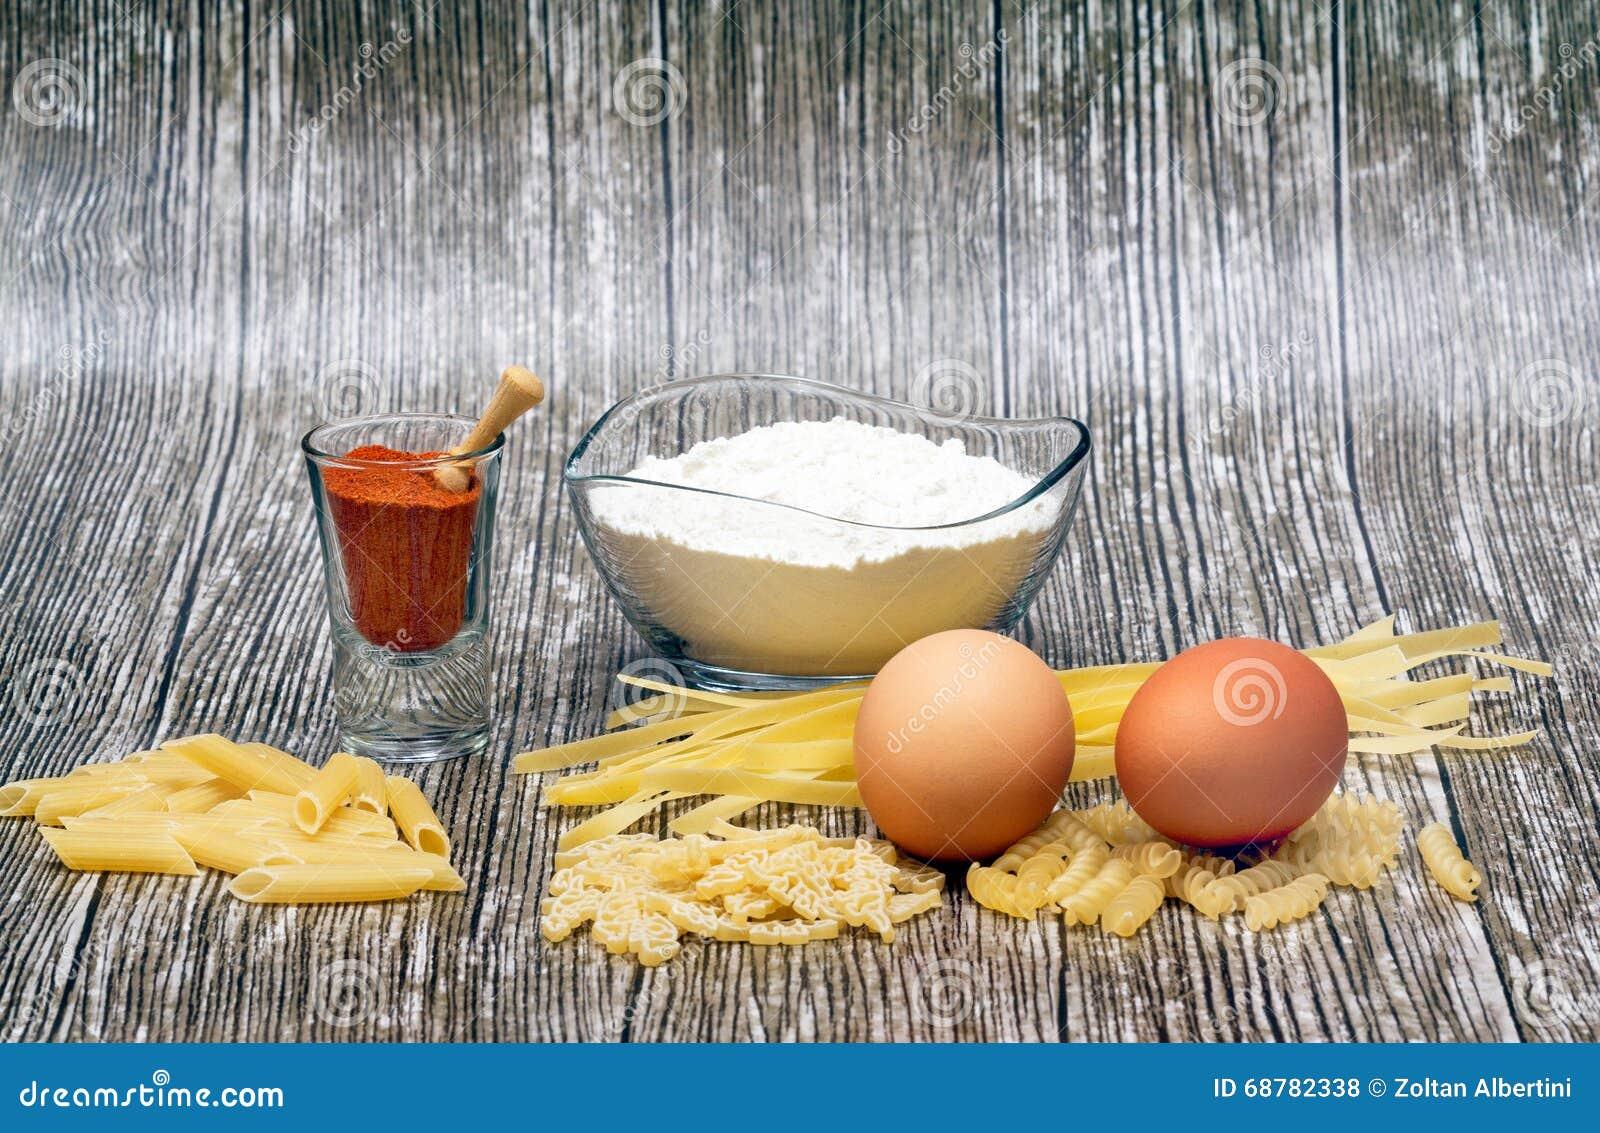 Pasta Stock Photo Image 68782338